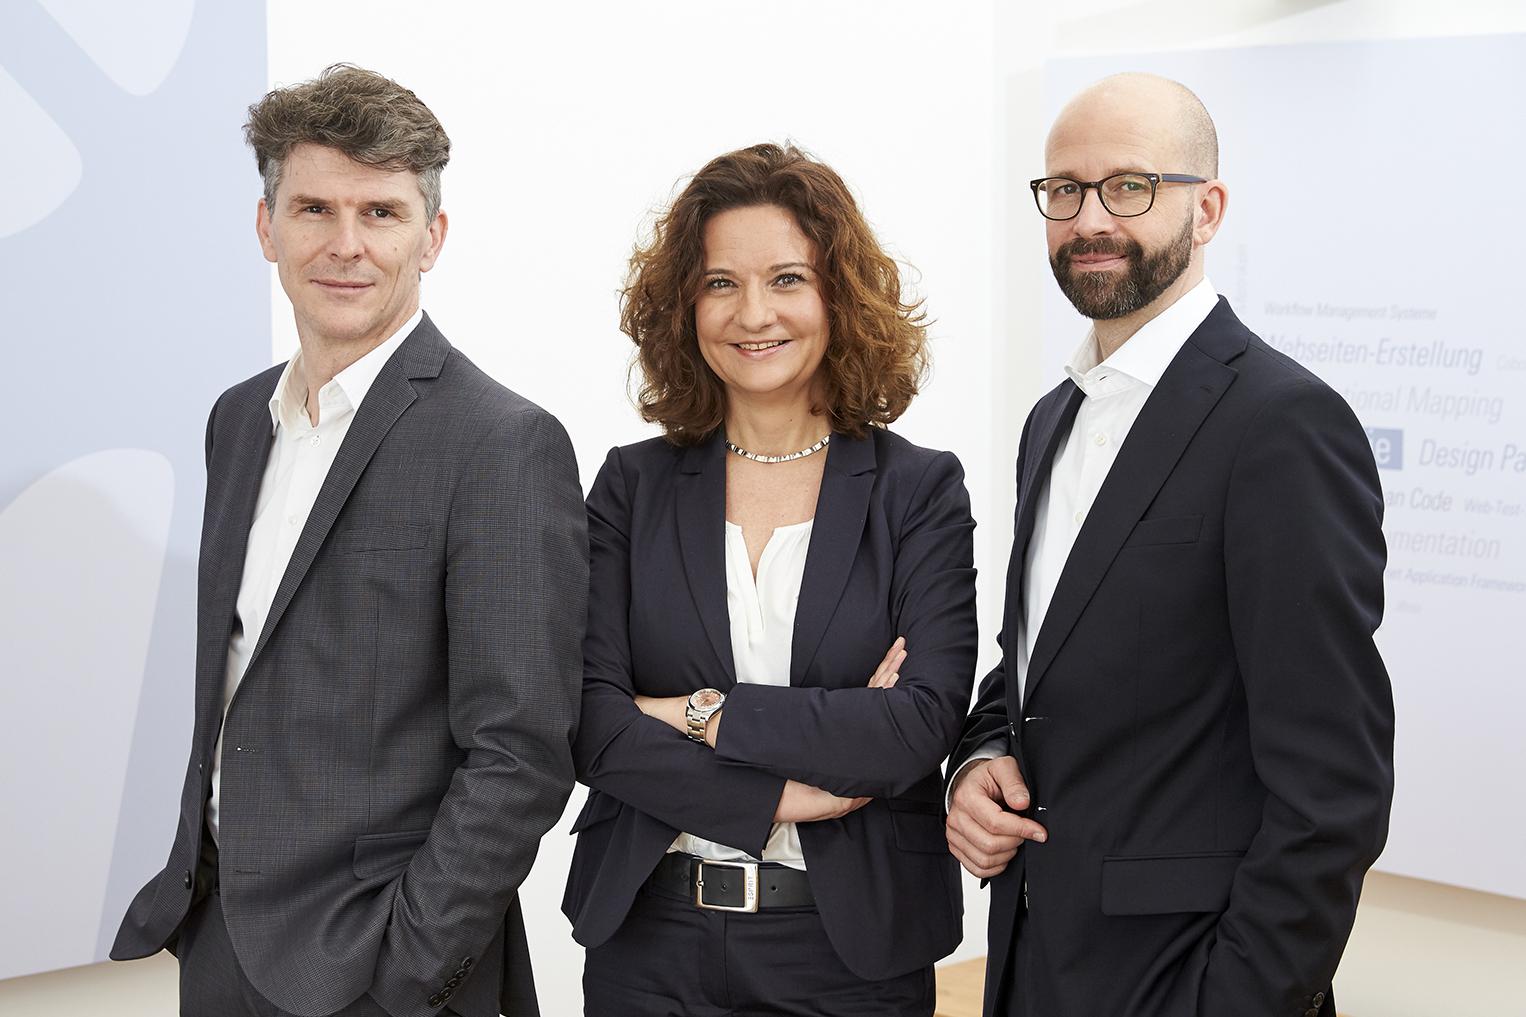 Management-Team bei it-economics (v.l.) Tobias Fischer (CFO), Petra Ozimek-Zimmermann (CHRO), Torsten Klein (CEO)